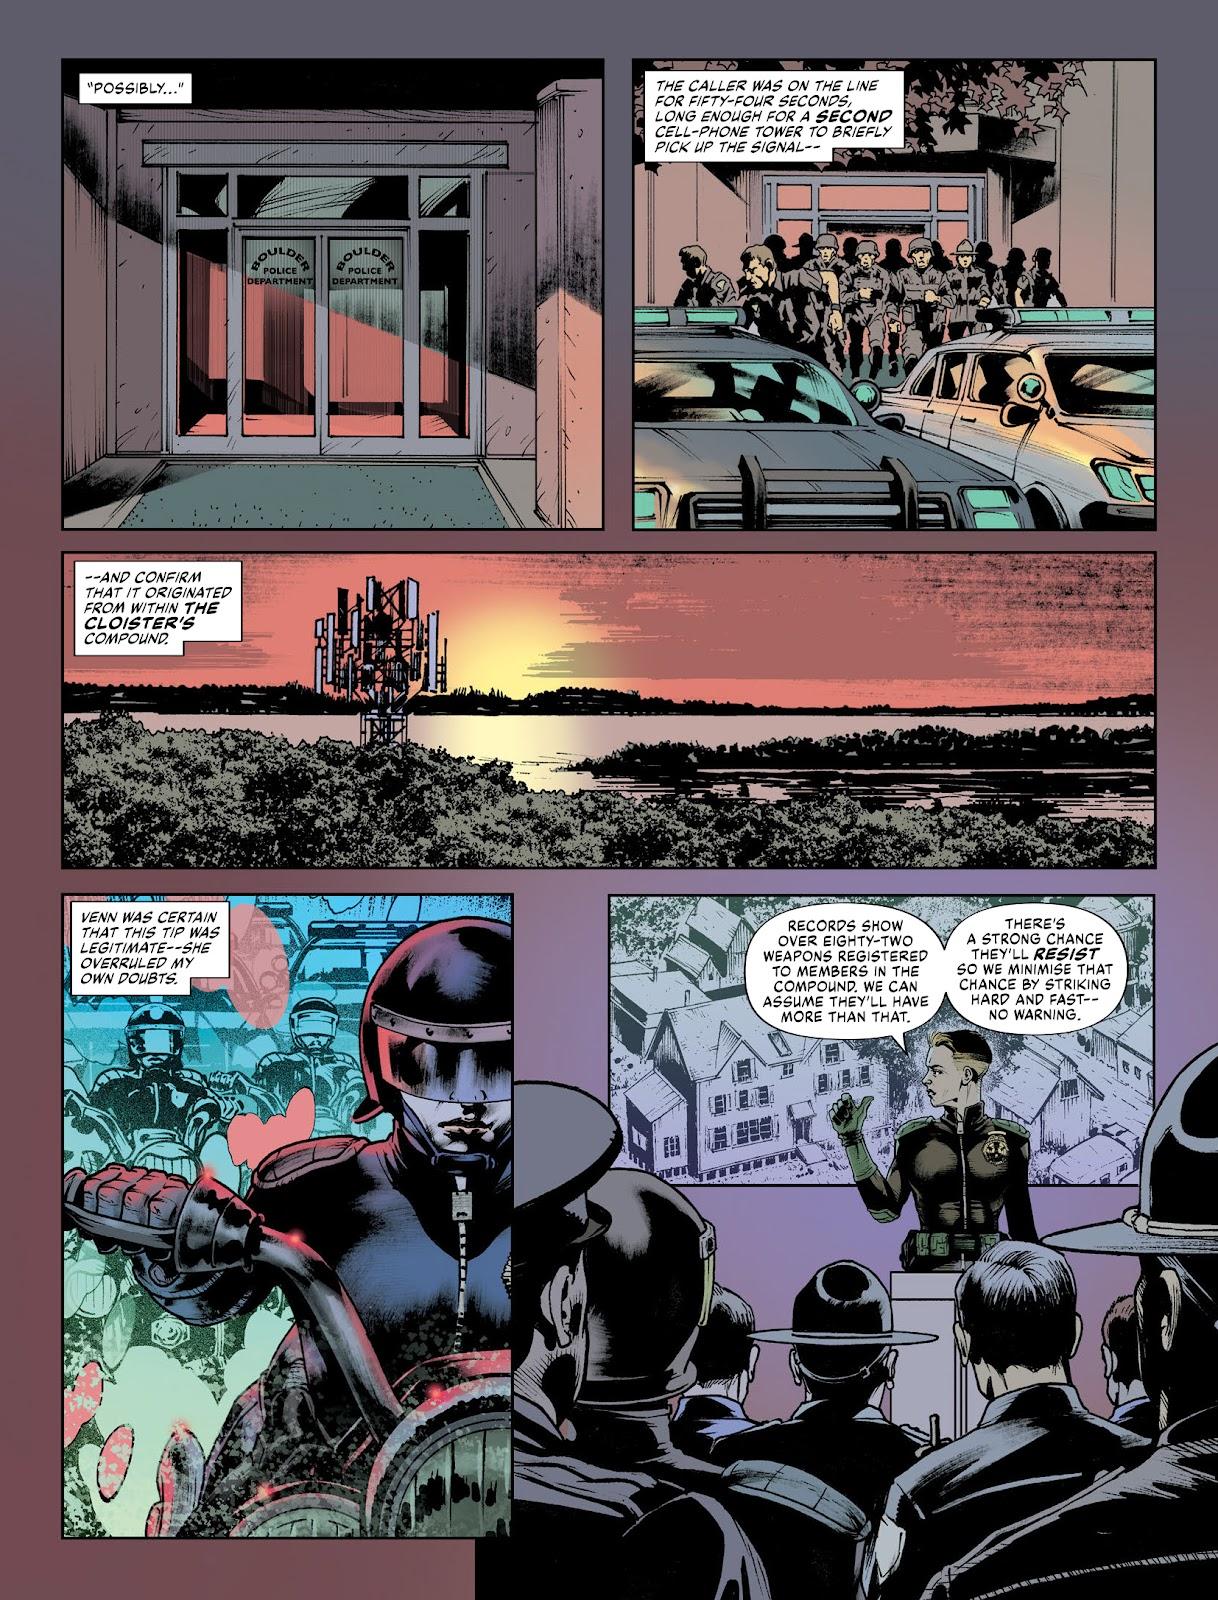 Judge Dredd Megazine (Vol. 5) issue 427 - Page 35